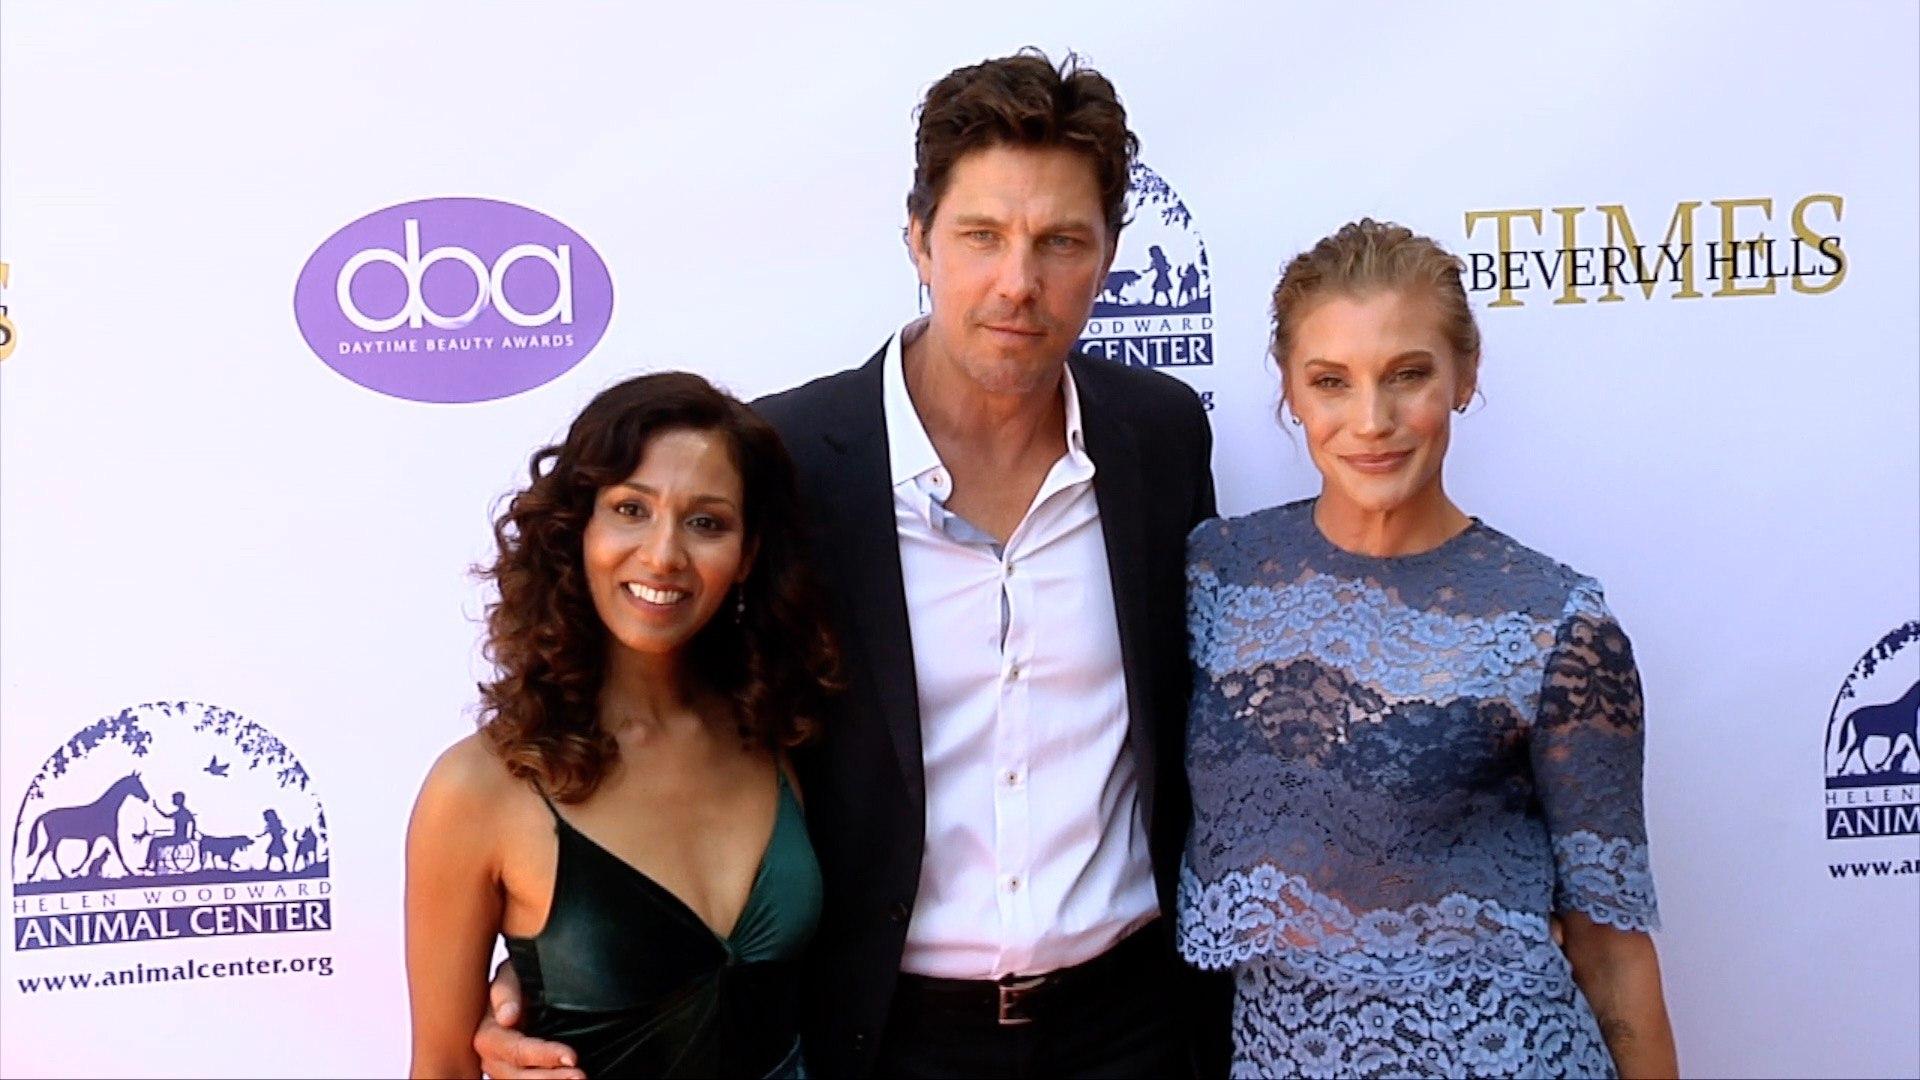 Rekha Sharma, Michael Trucco, Katee Sackhoff 2019 Daytime Beauty Awards Red Carpet